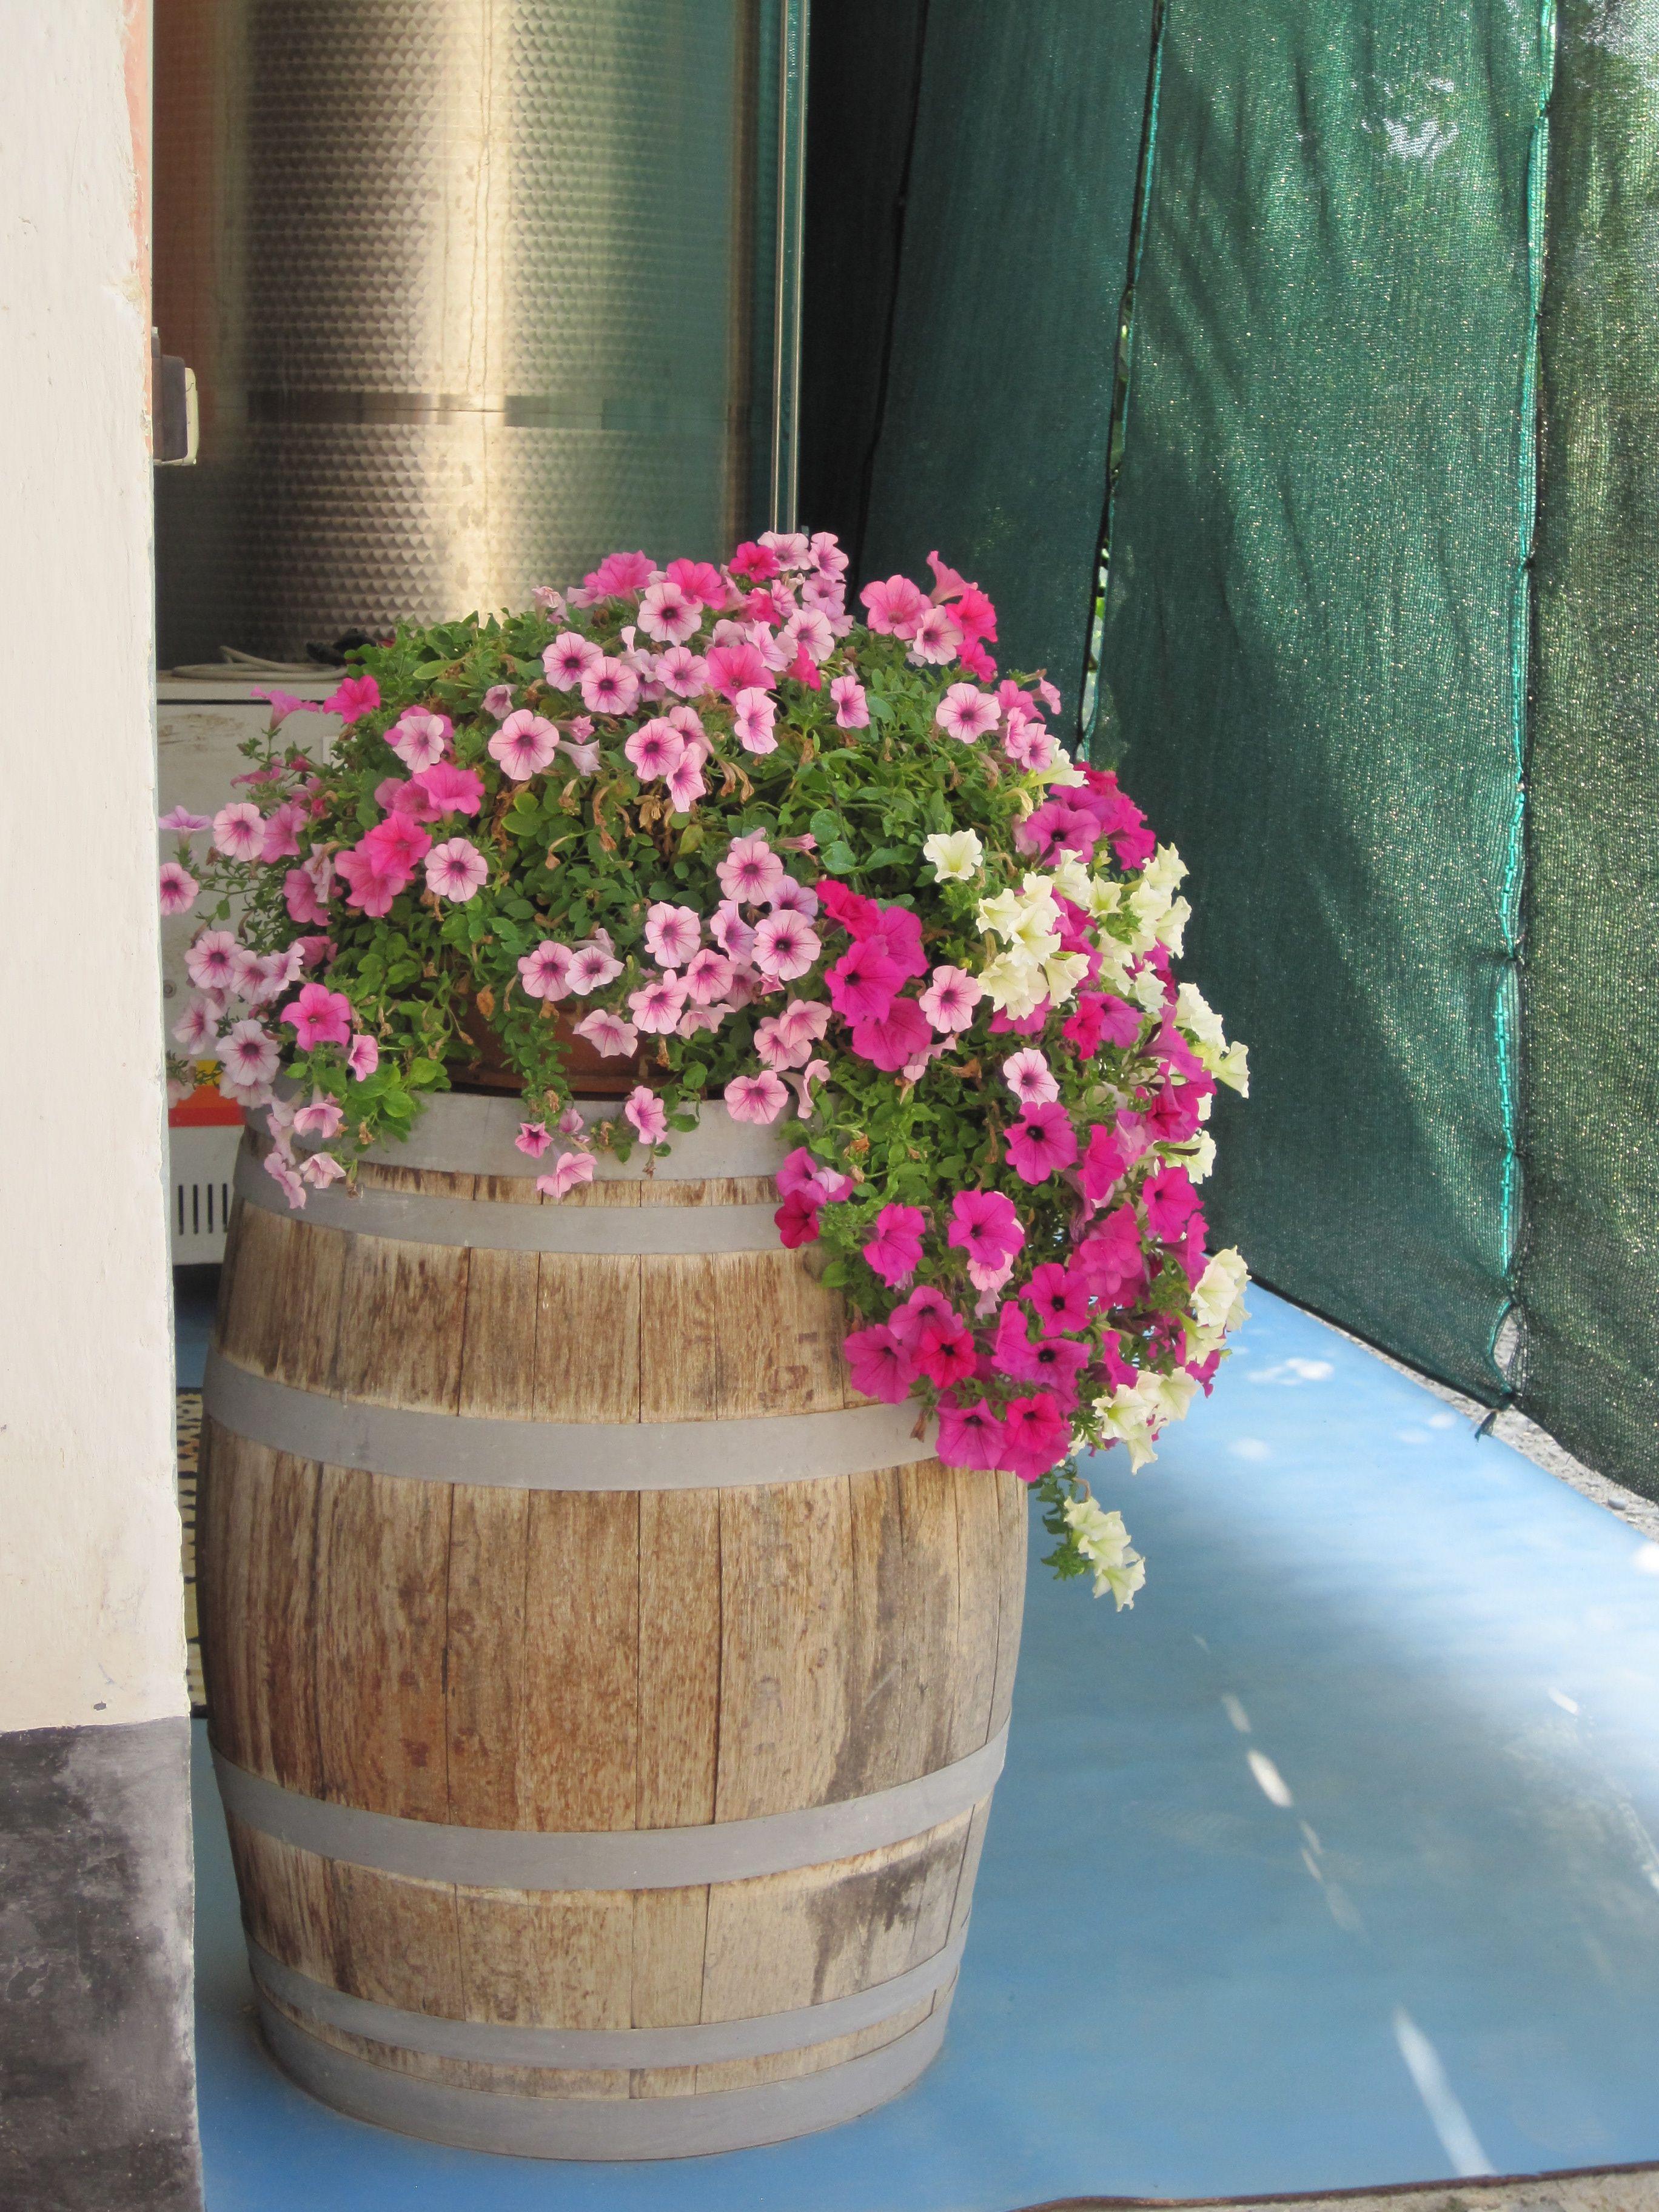 Wine barrel planter gardening so many ideas so little time pinterest wine barrel - Weinfass dekorieren ...